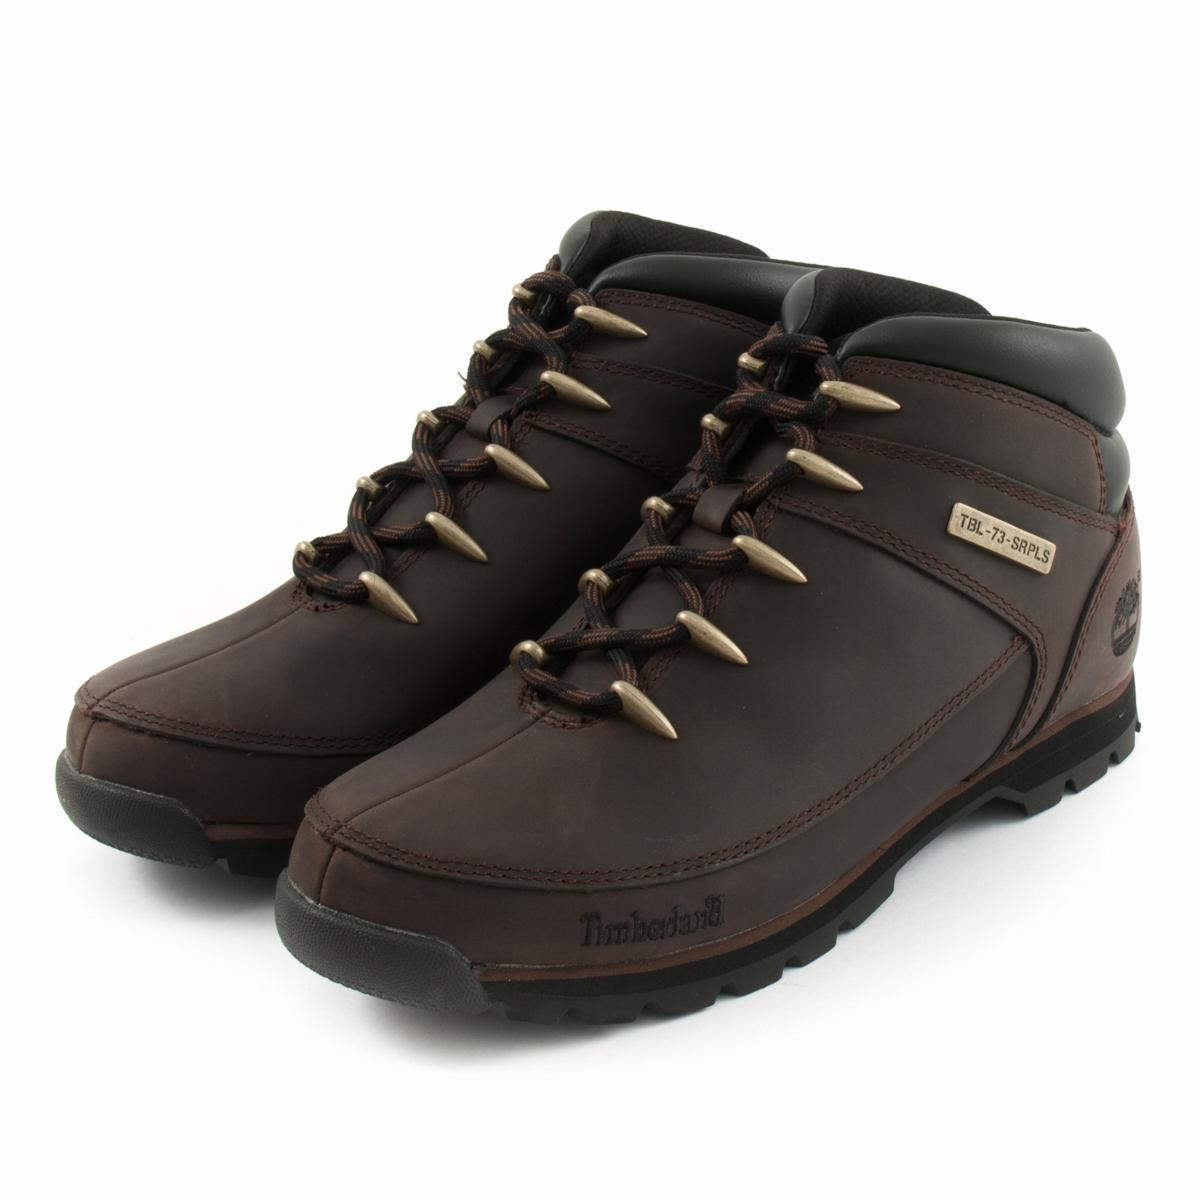 la mejor actitud a1def 96df4 Boots TIMBERLAND Euro Sprint Hiker Dark Brown A11ZM